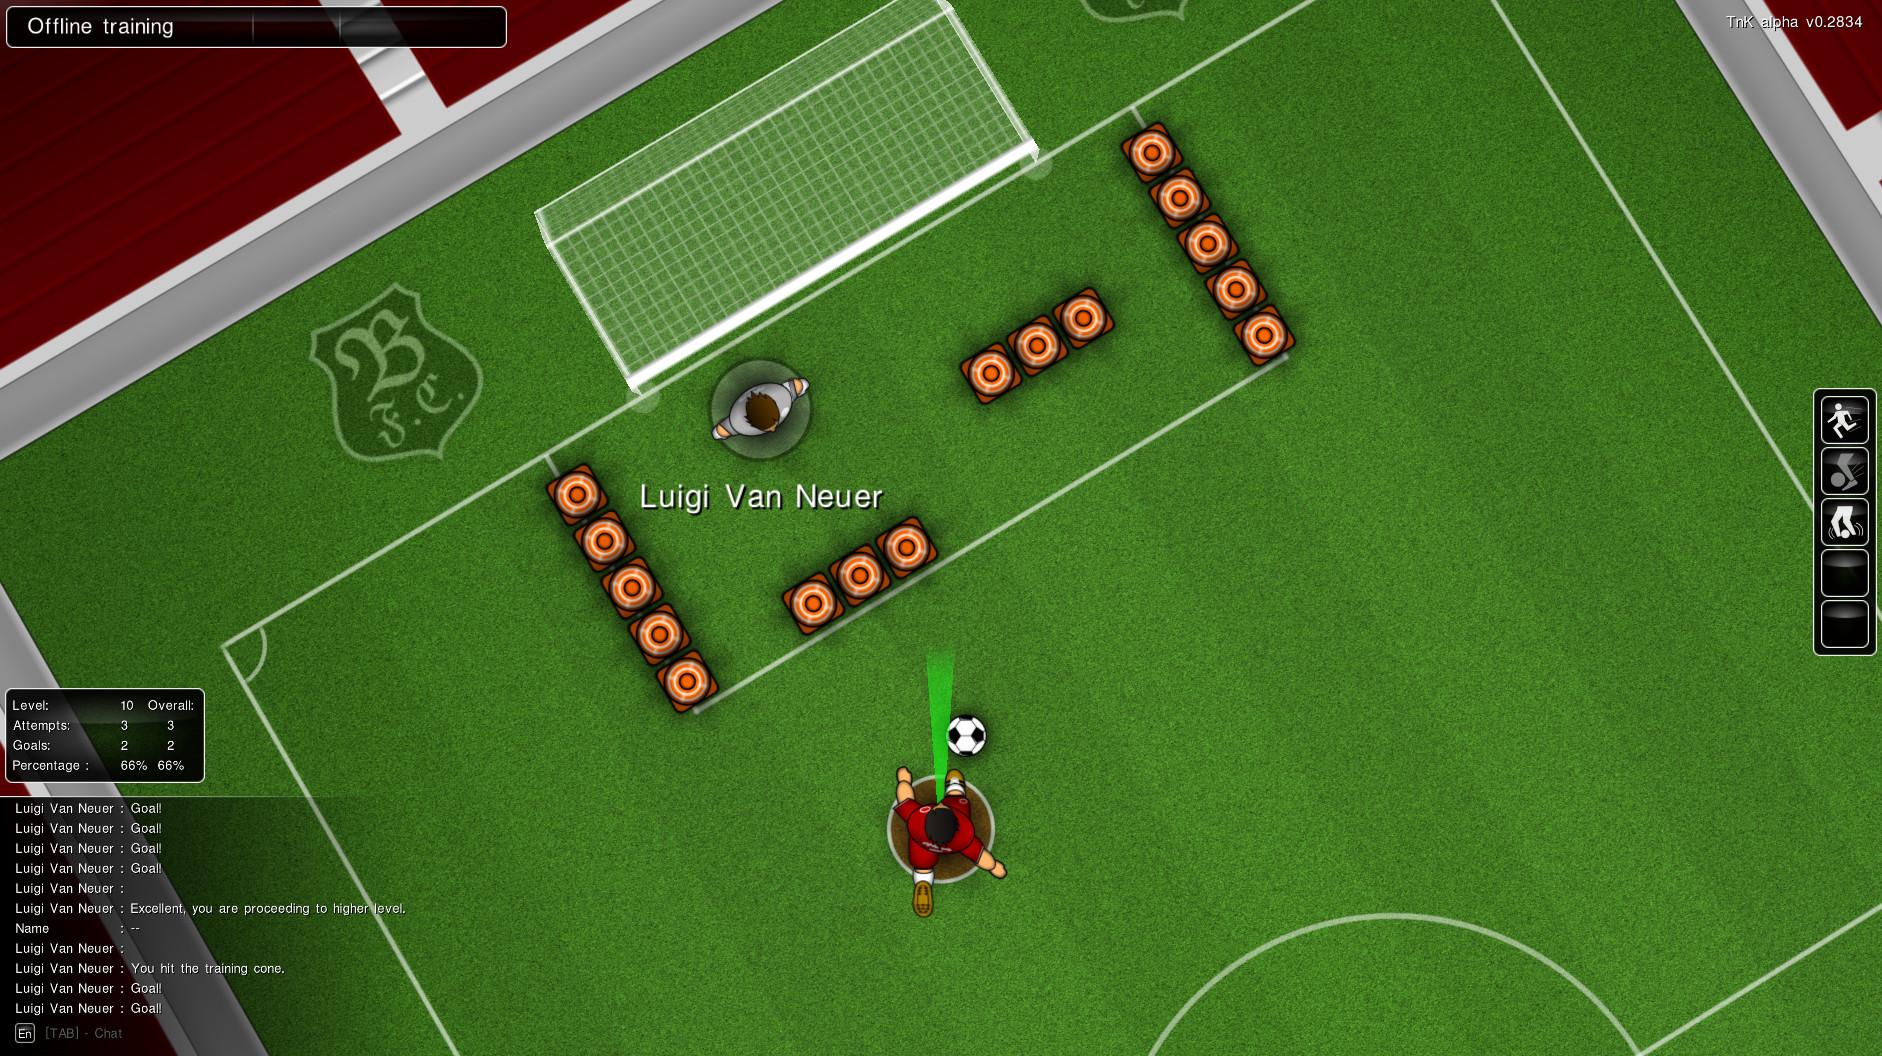 Training - shots on goal.